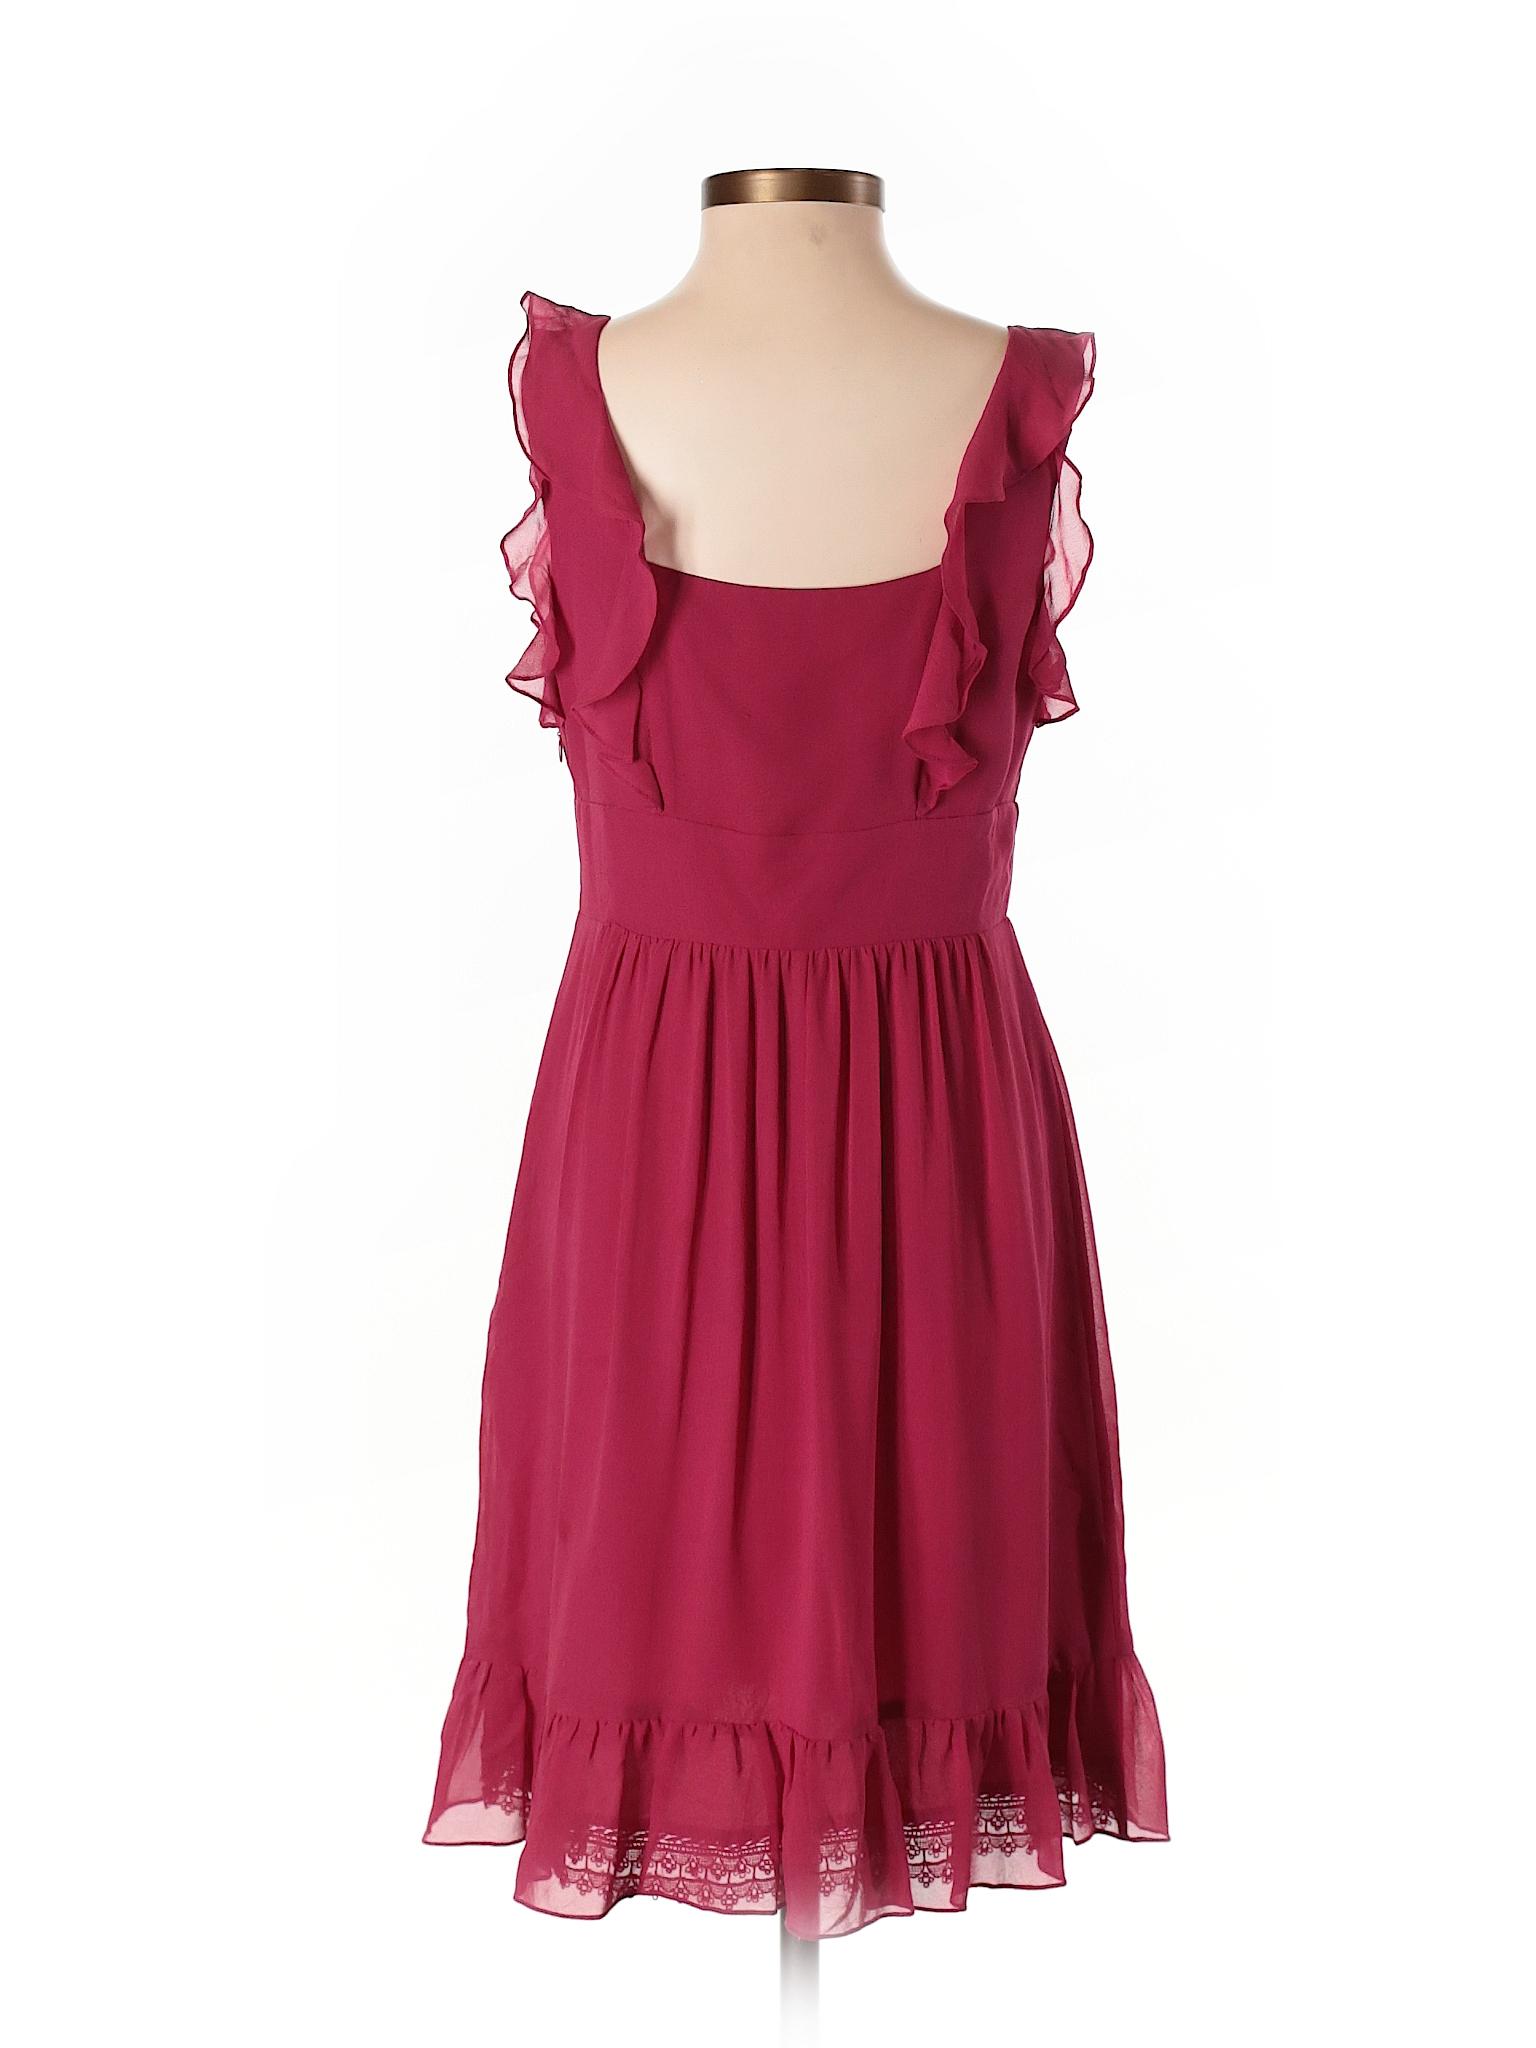 Soeurs Moulinette winter Boutique Dress Casual faYxAq